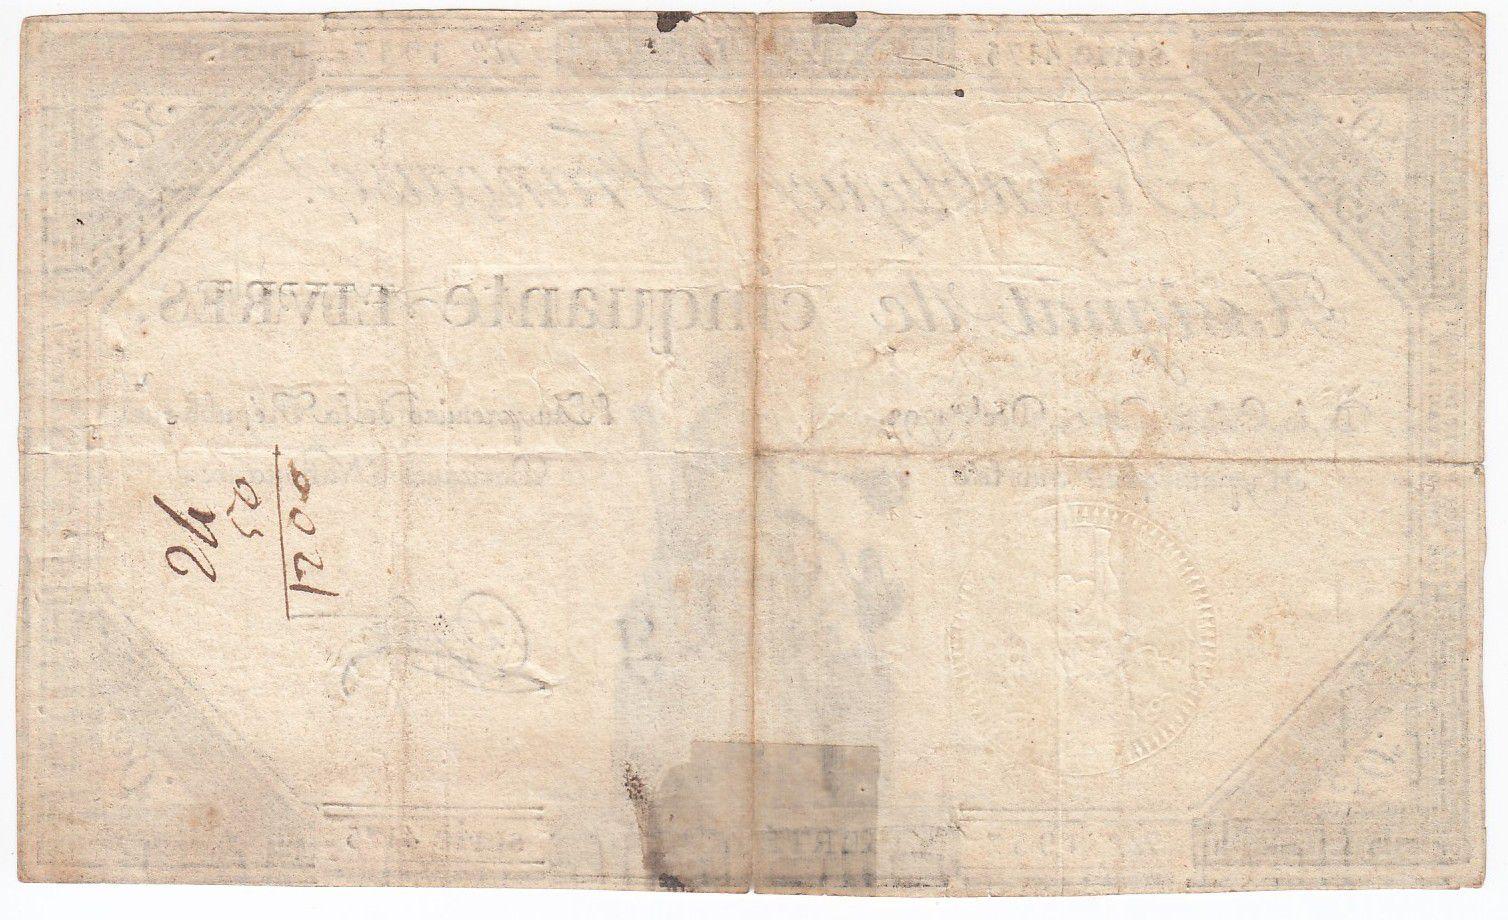 France 50 Livres France assise - 14-12-1792 - Sign. Dufour - TTB